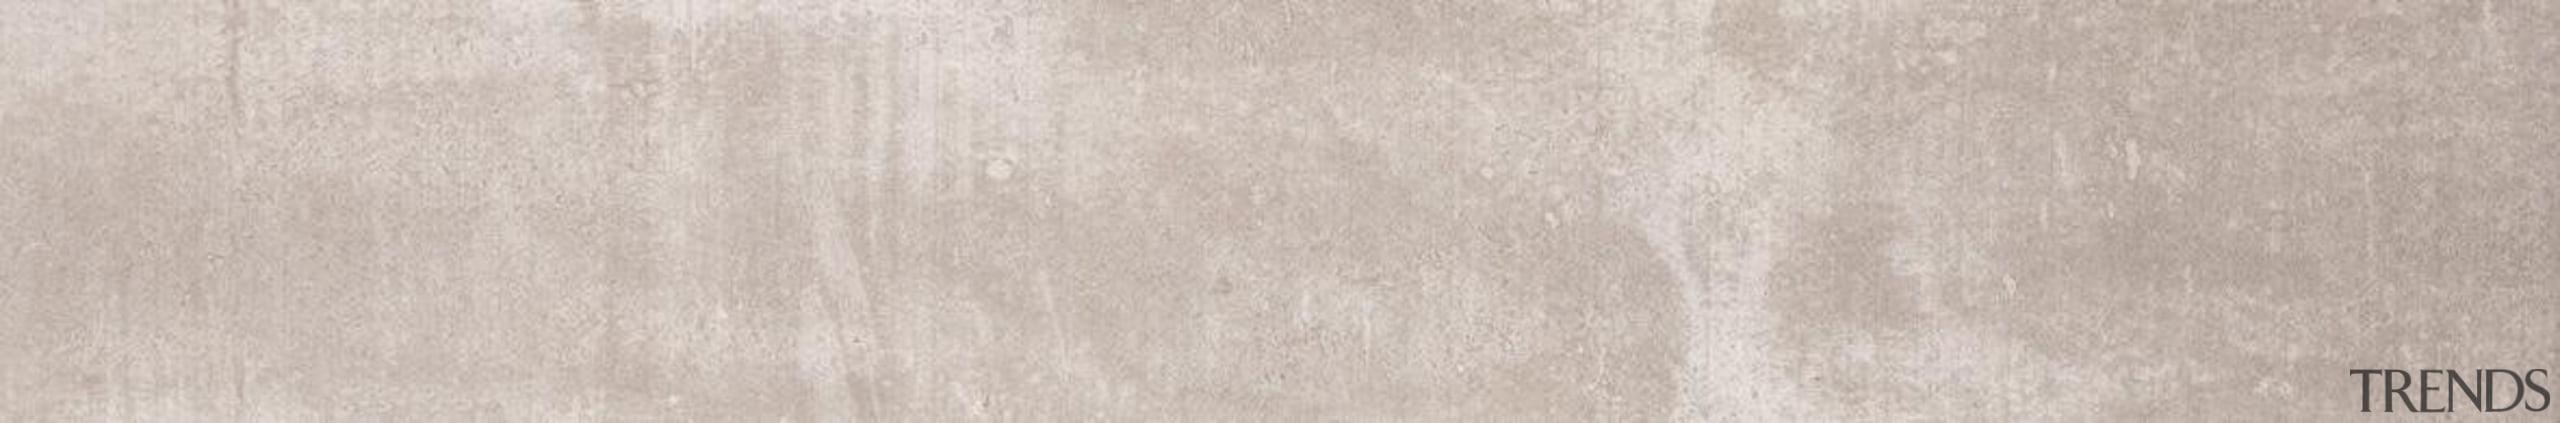 1200x200mm porcelain floor/wall tiles - Concreto Cinza 1200x200 floor, flooring, line, texture, white, wood, wood flooring, wood stain, gray